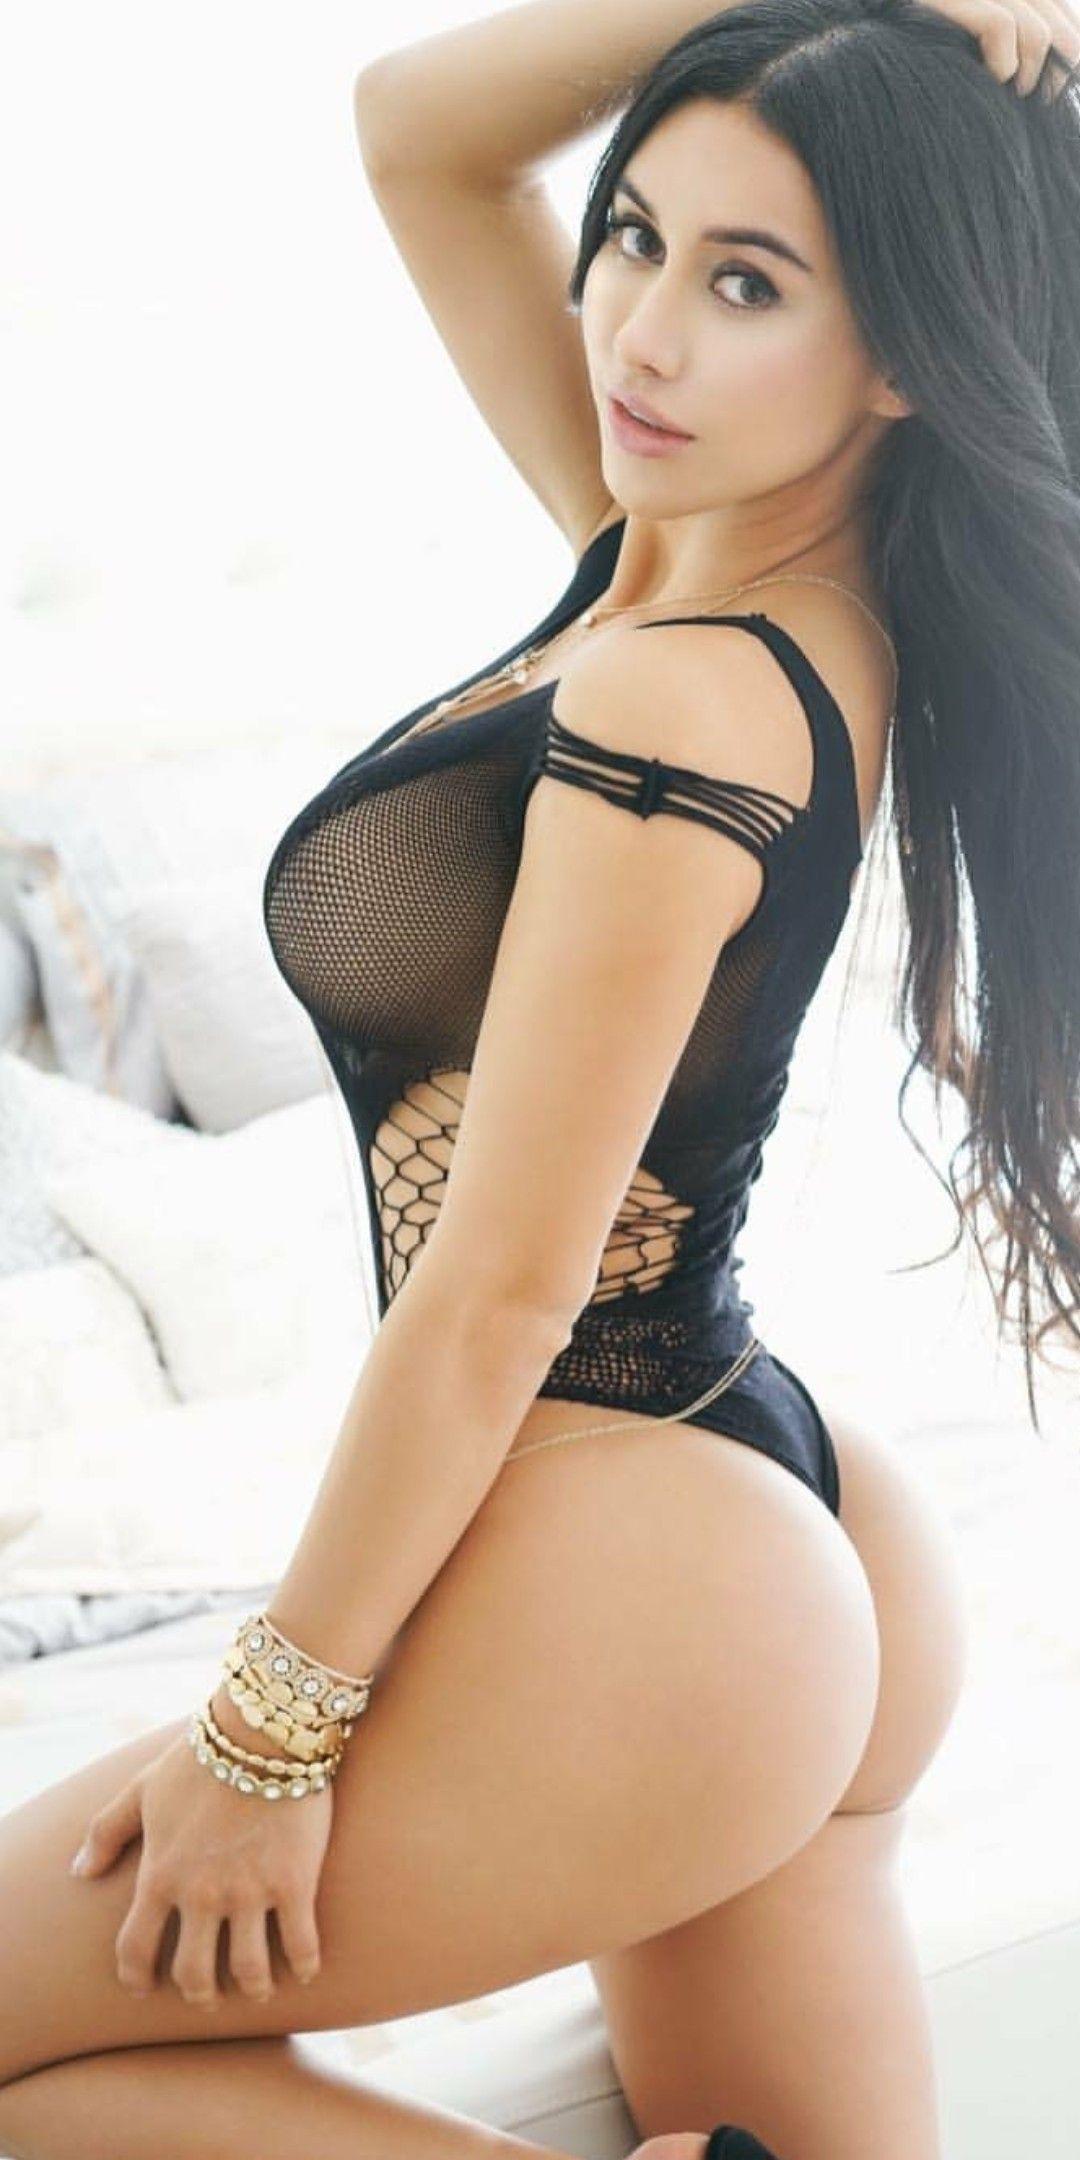 Erotica Joselyn Cano naked (49 photo), Tits, Bikini, Feet, braless 2019